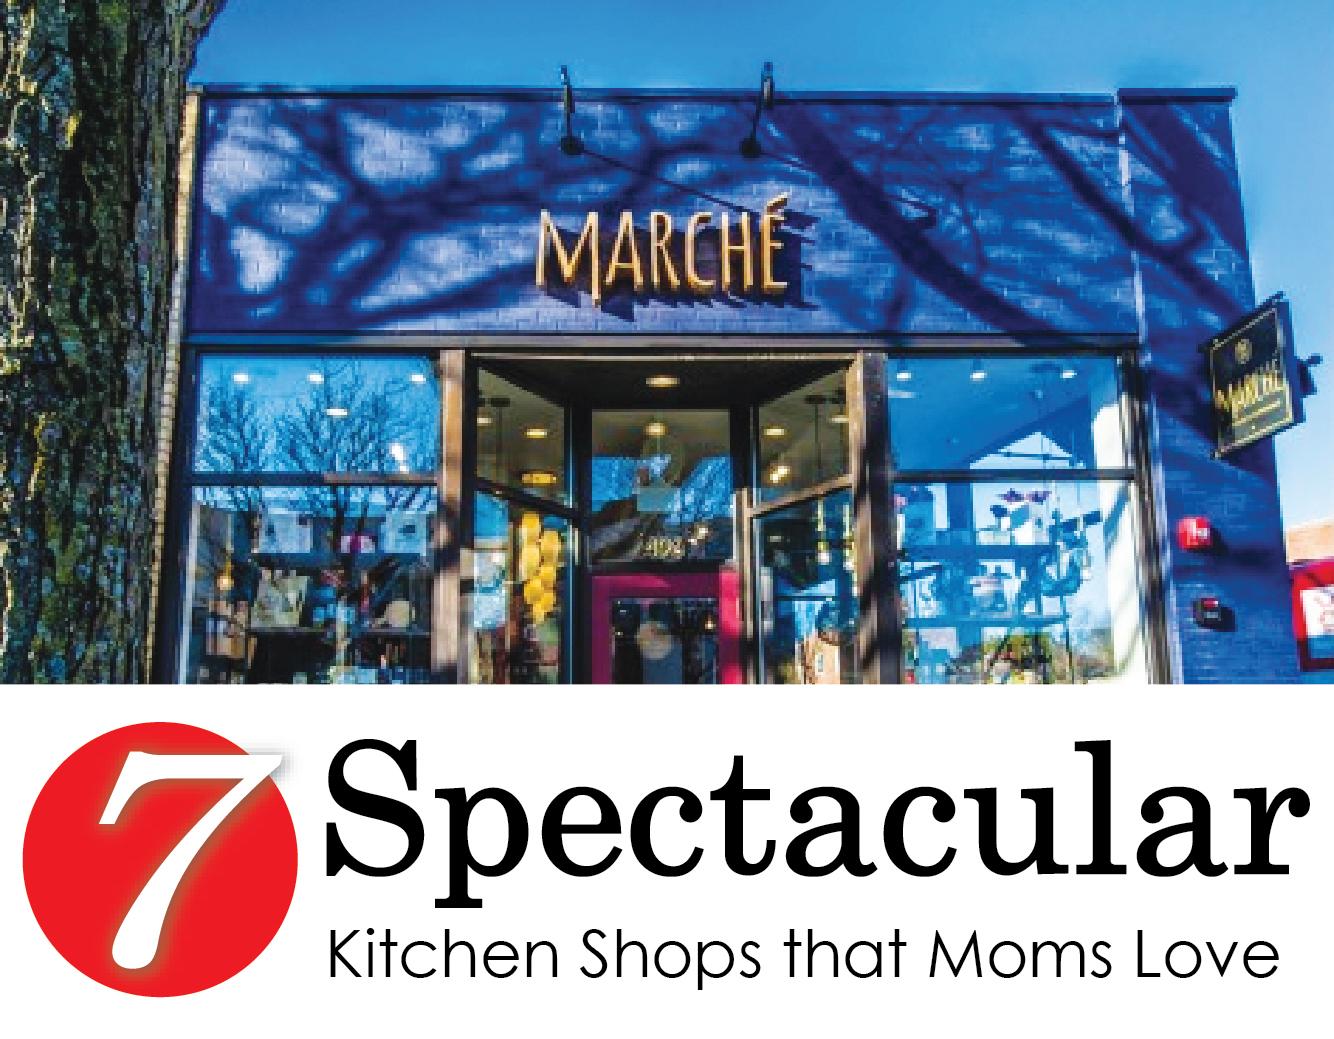 7 SPECTACULAR | Kitchen Shops that Moms Love | Glancer Magazine